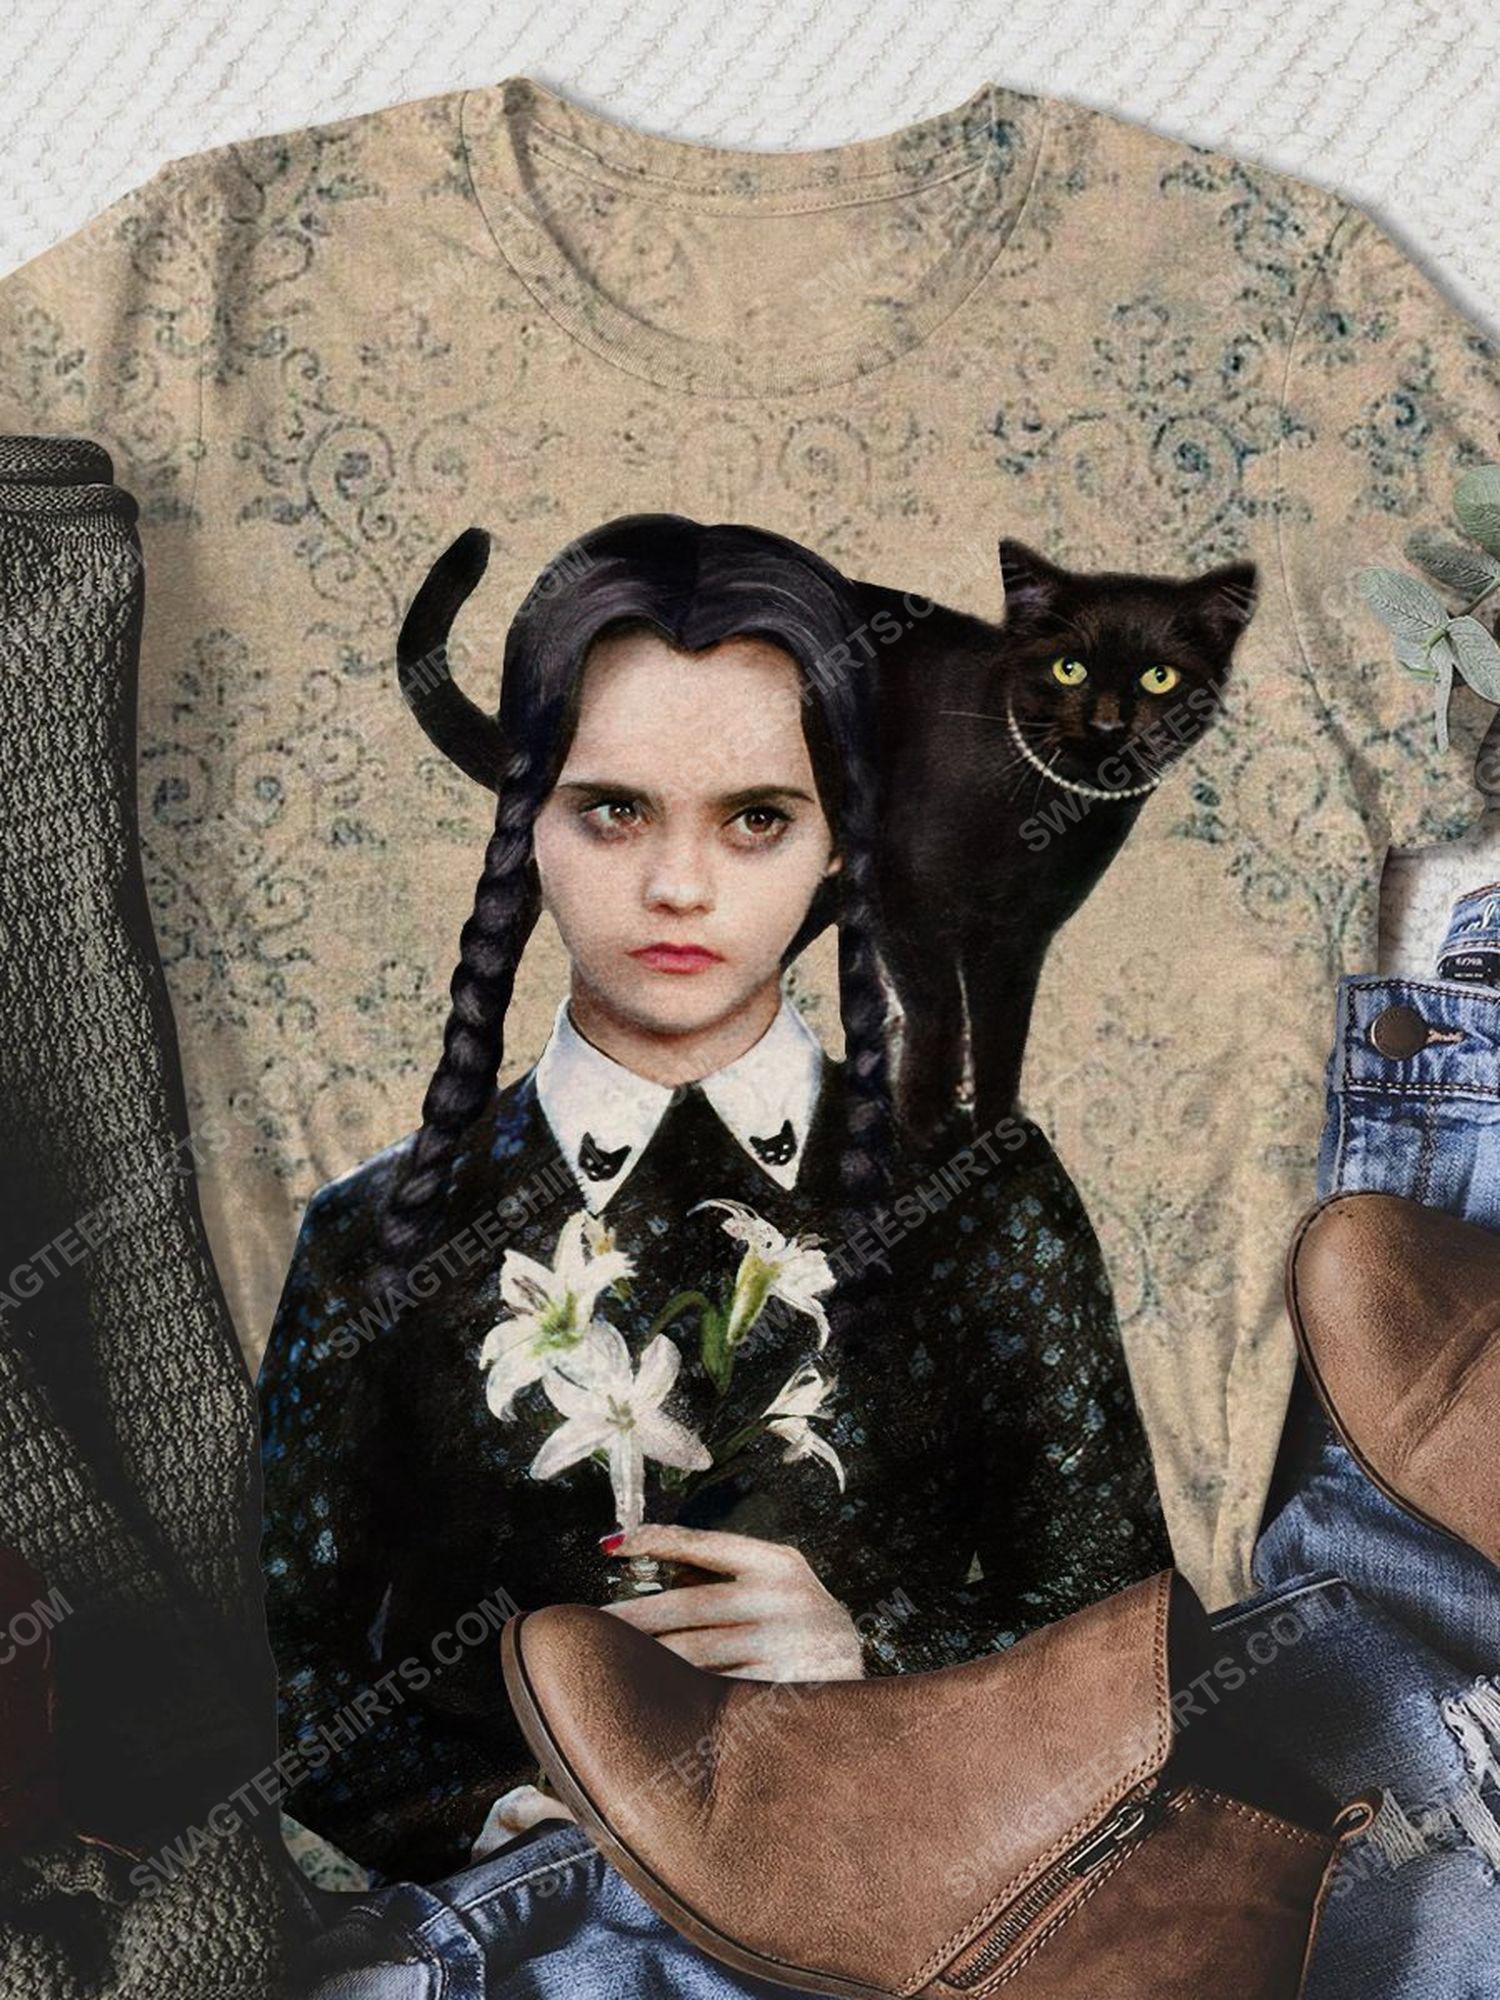 Halloween night wednesday addams and cat full print shirt 1 - Copy (3)